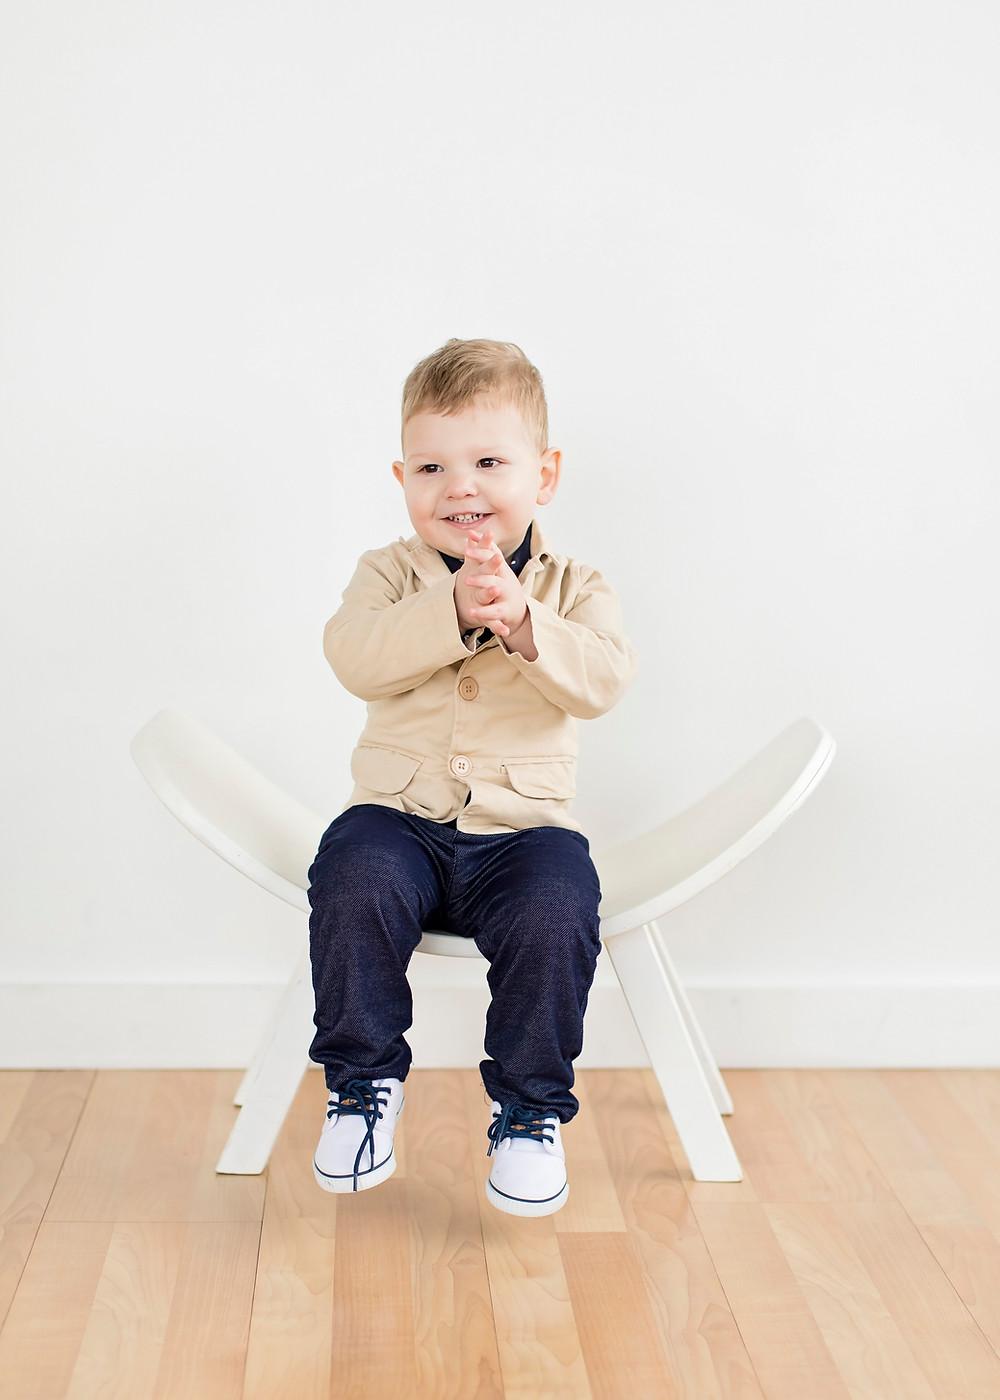 Fargo Children Photographer